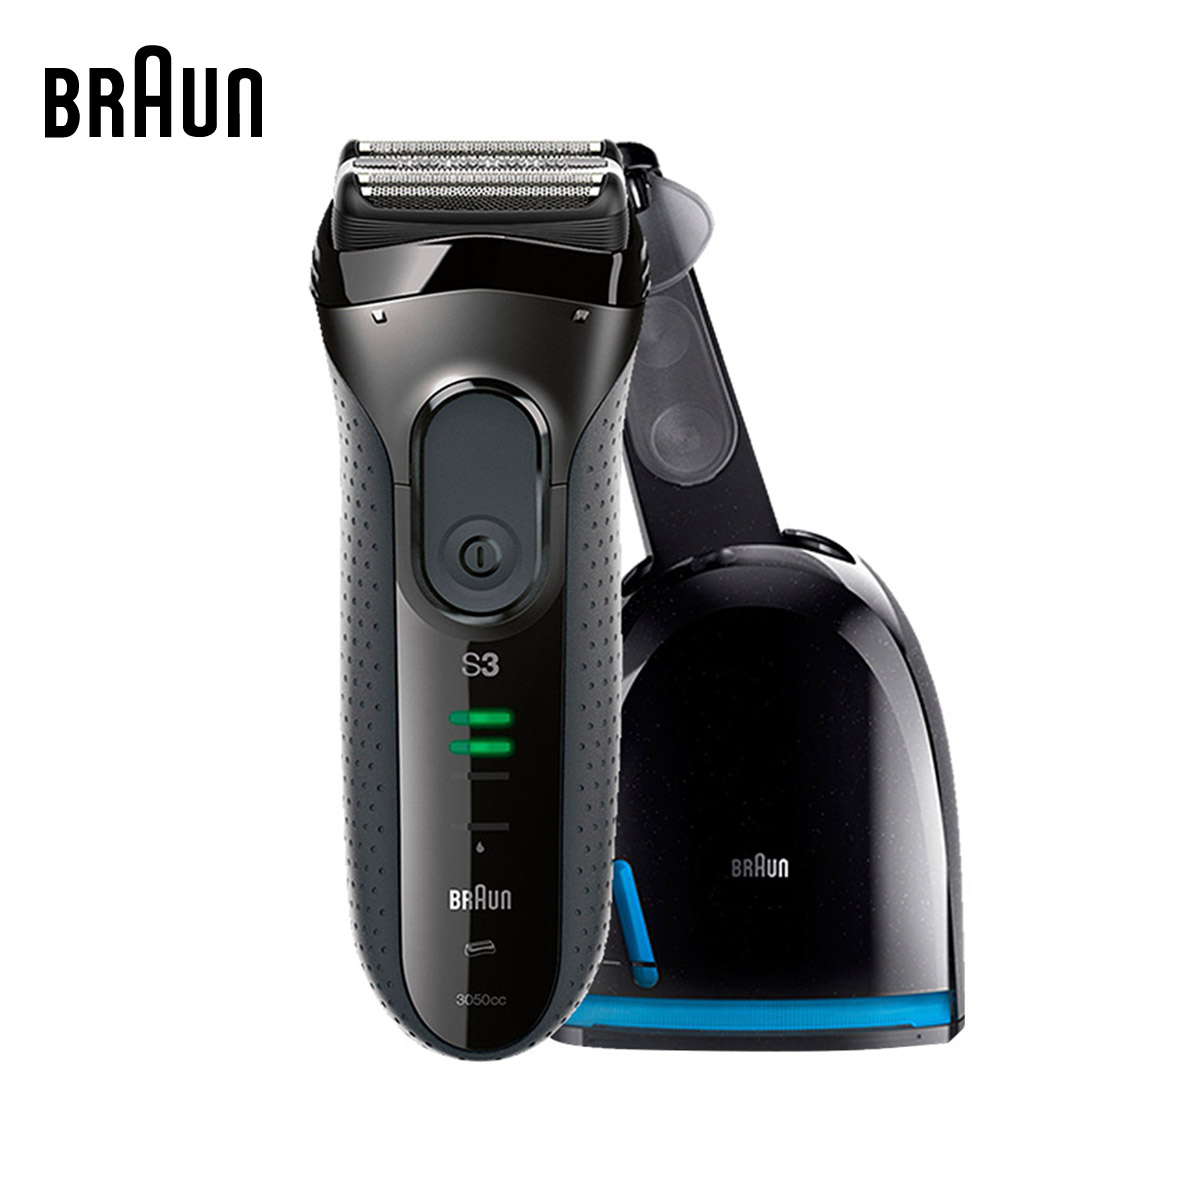 Braun Safety Electric Shaver Razor Series 3 3050cc for Men Electric Razor Washable Reciprocating Blade Automatic Cleaning Center merkur 45 bakelite safety razor travel set